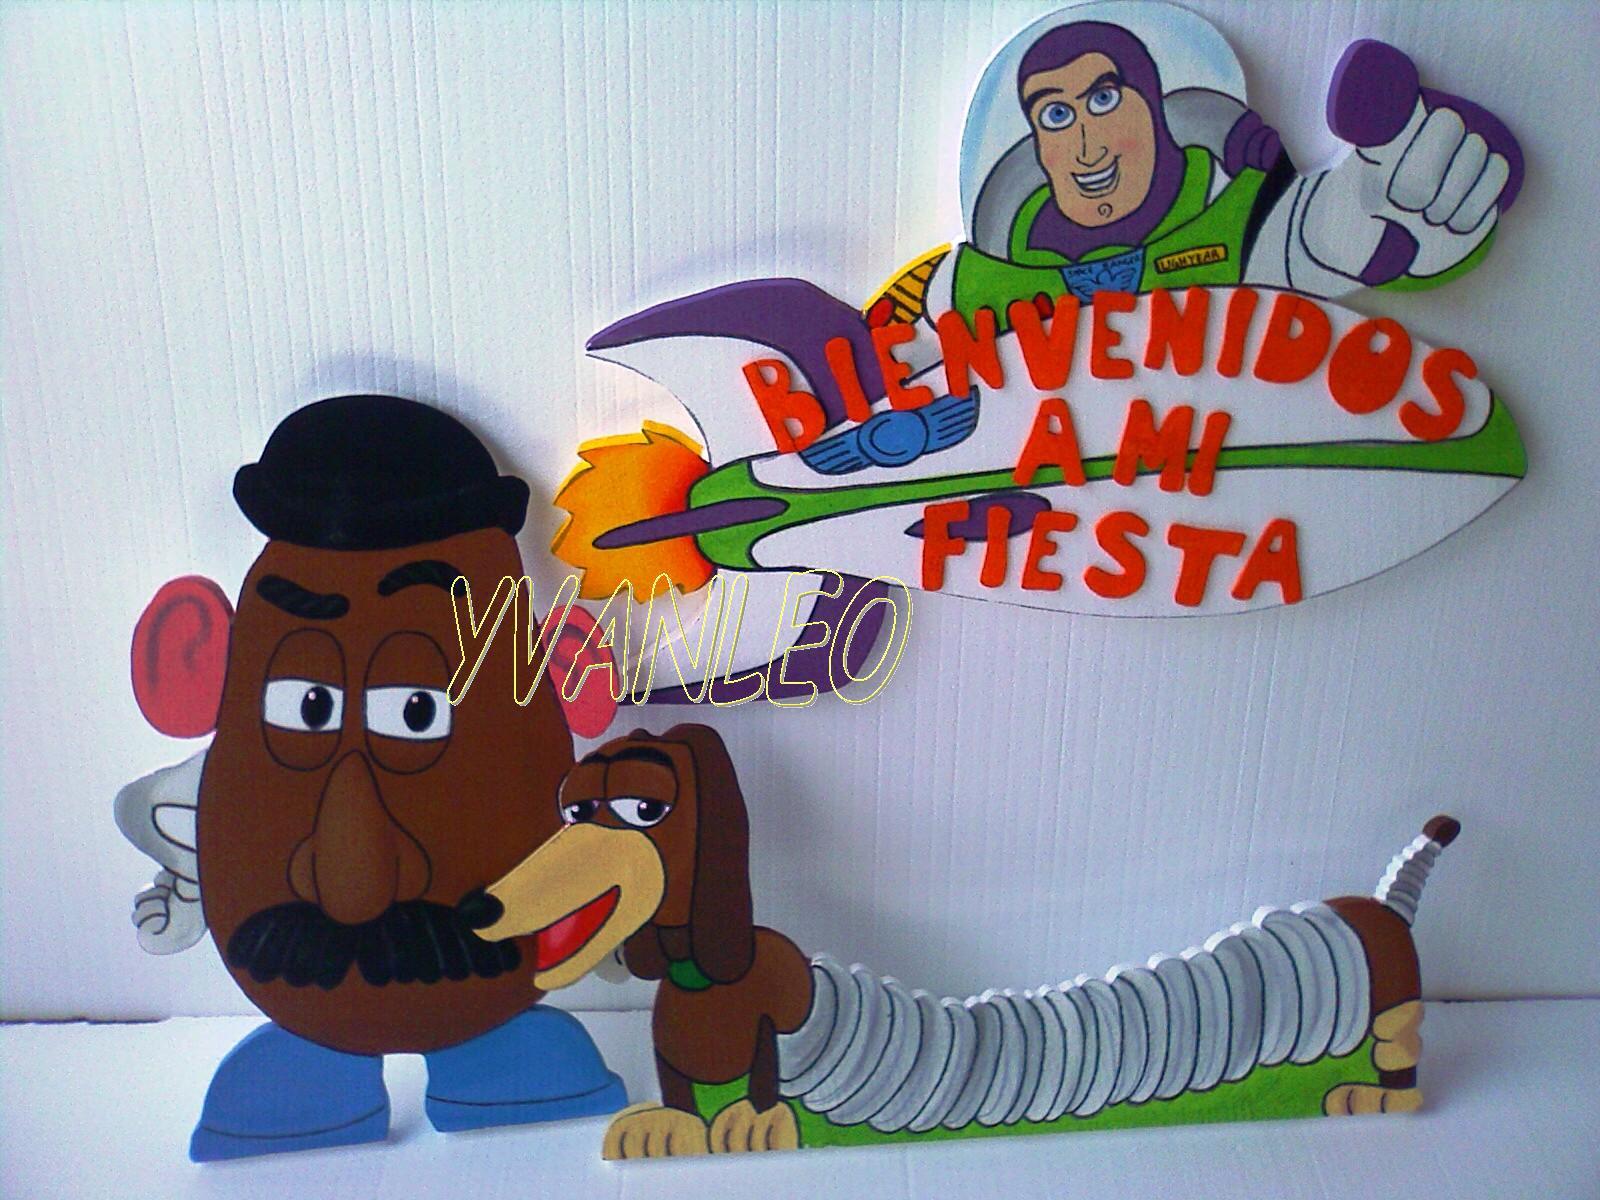 TODO EN FIGURAS DE ANIME YVANLEO: TOY STORY